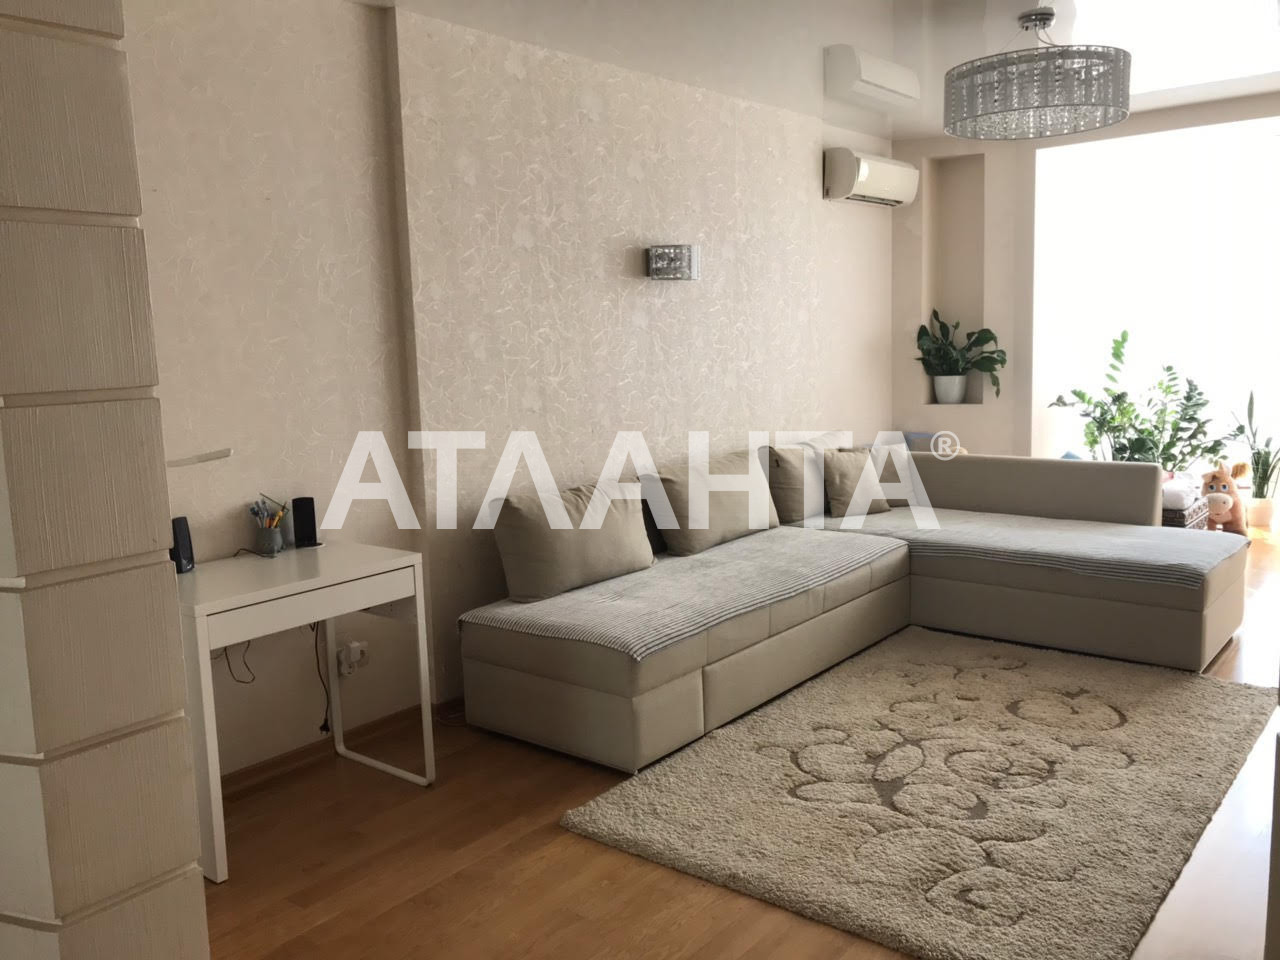 Продается 3-комнатная Квартира на ул. Ул. Ломоносова — 128 000 у.е. (фото №9)